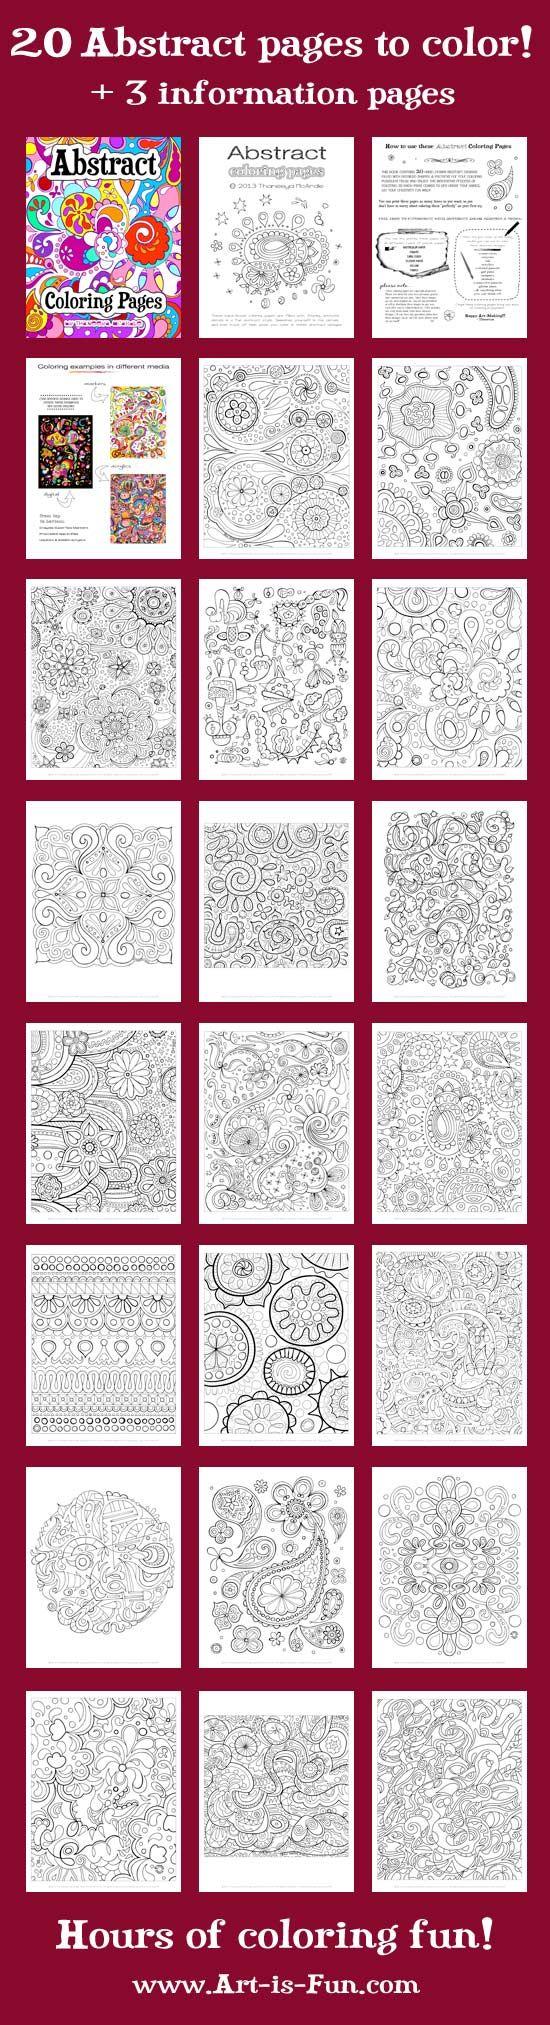 Pin de Calli Robertson en craft things. | Pinterest | Mandalas ...